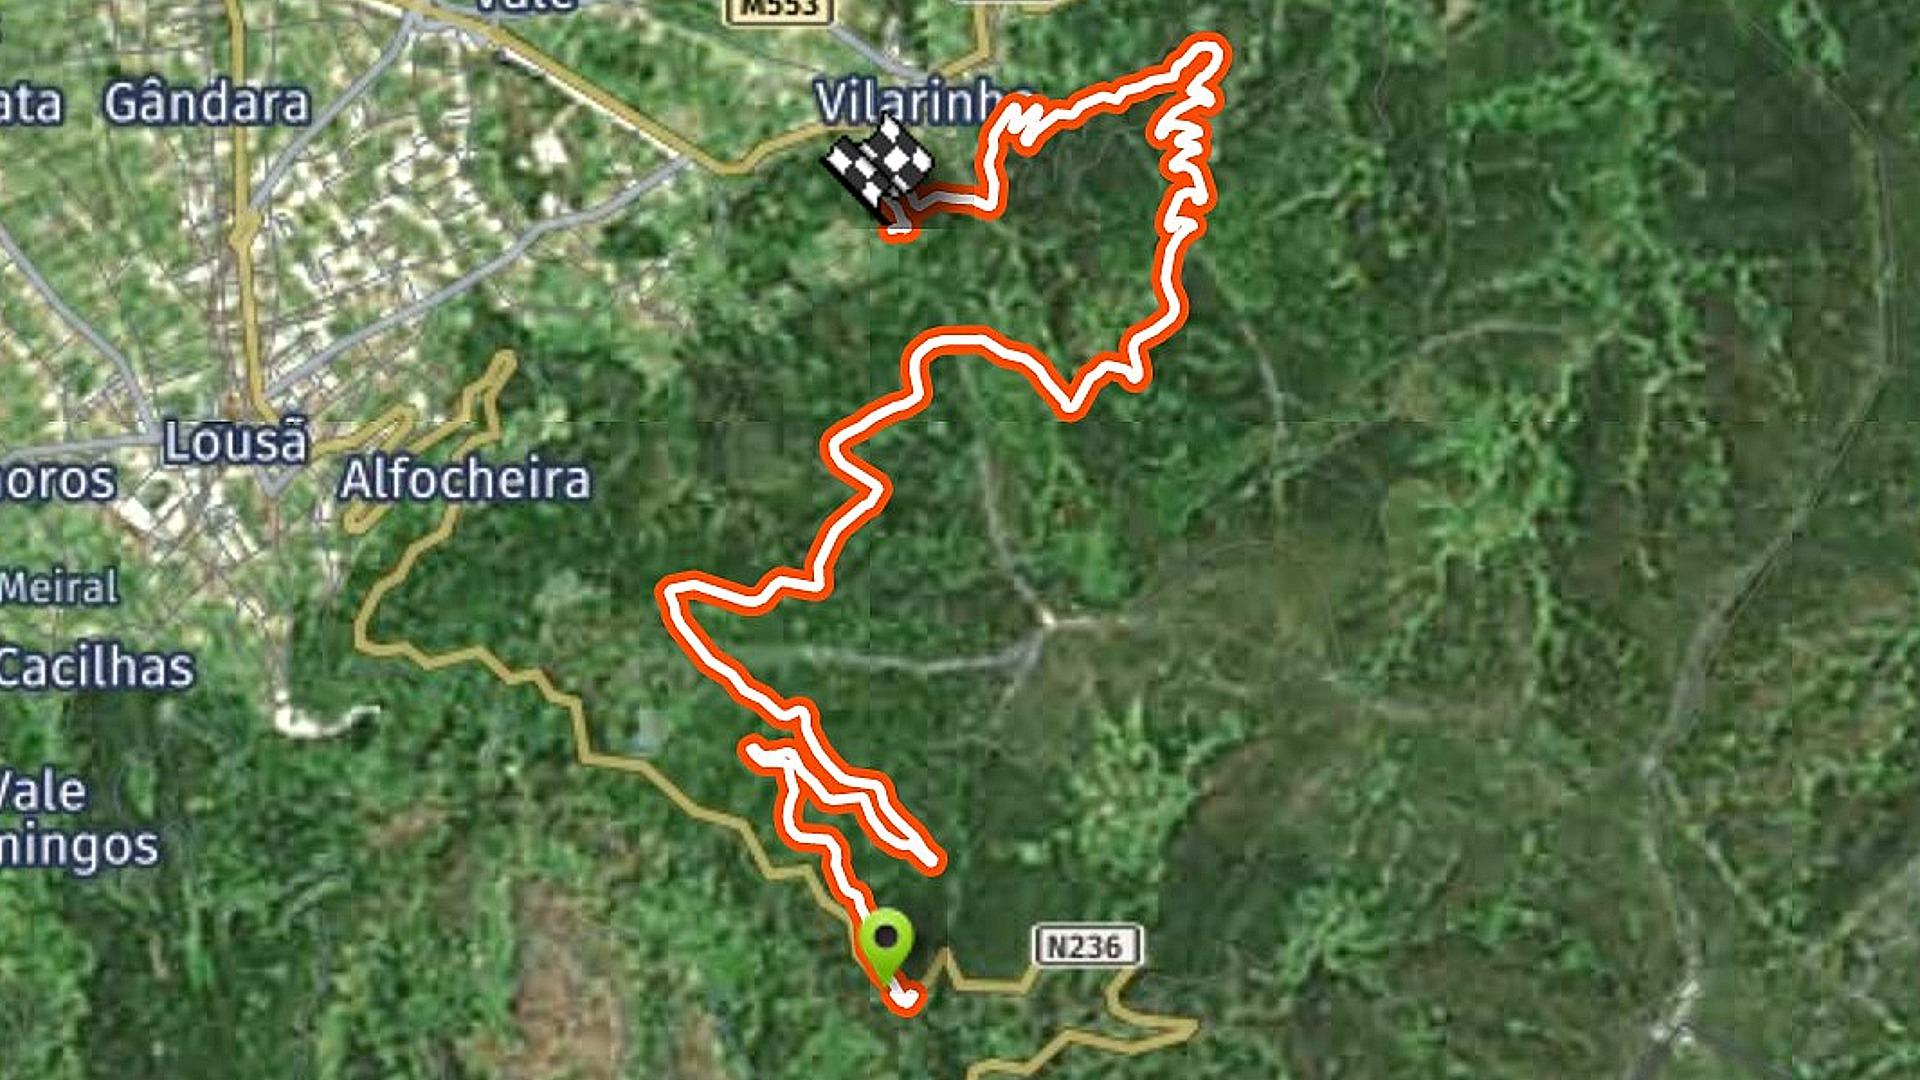 WRC: 54º Vodafone Rallye de Portugal [20-23 de Mayo] - Página 3 210521_WRC-SS1-SS4-Portugal_001